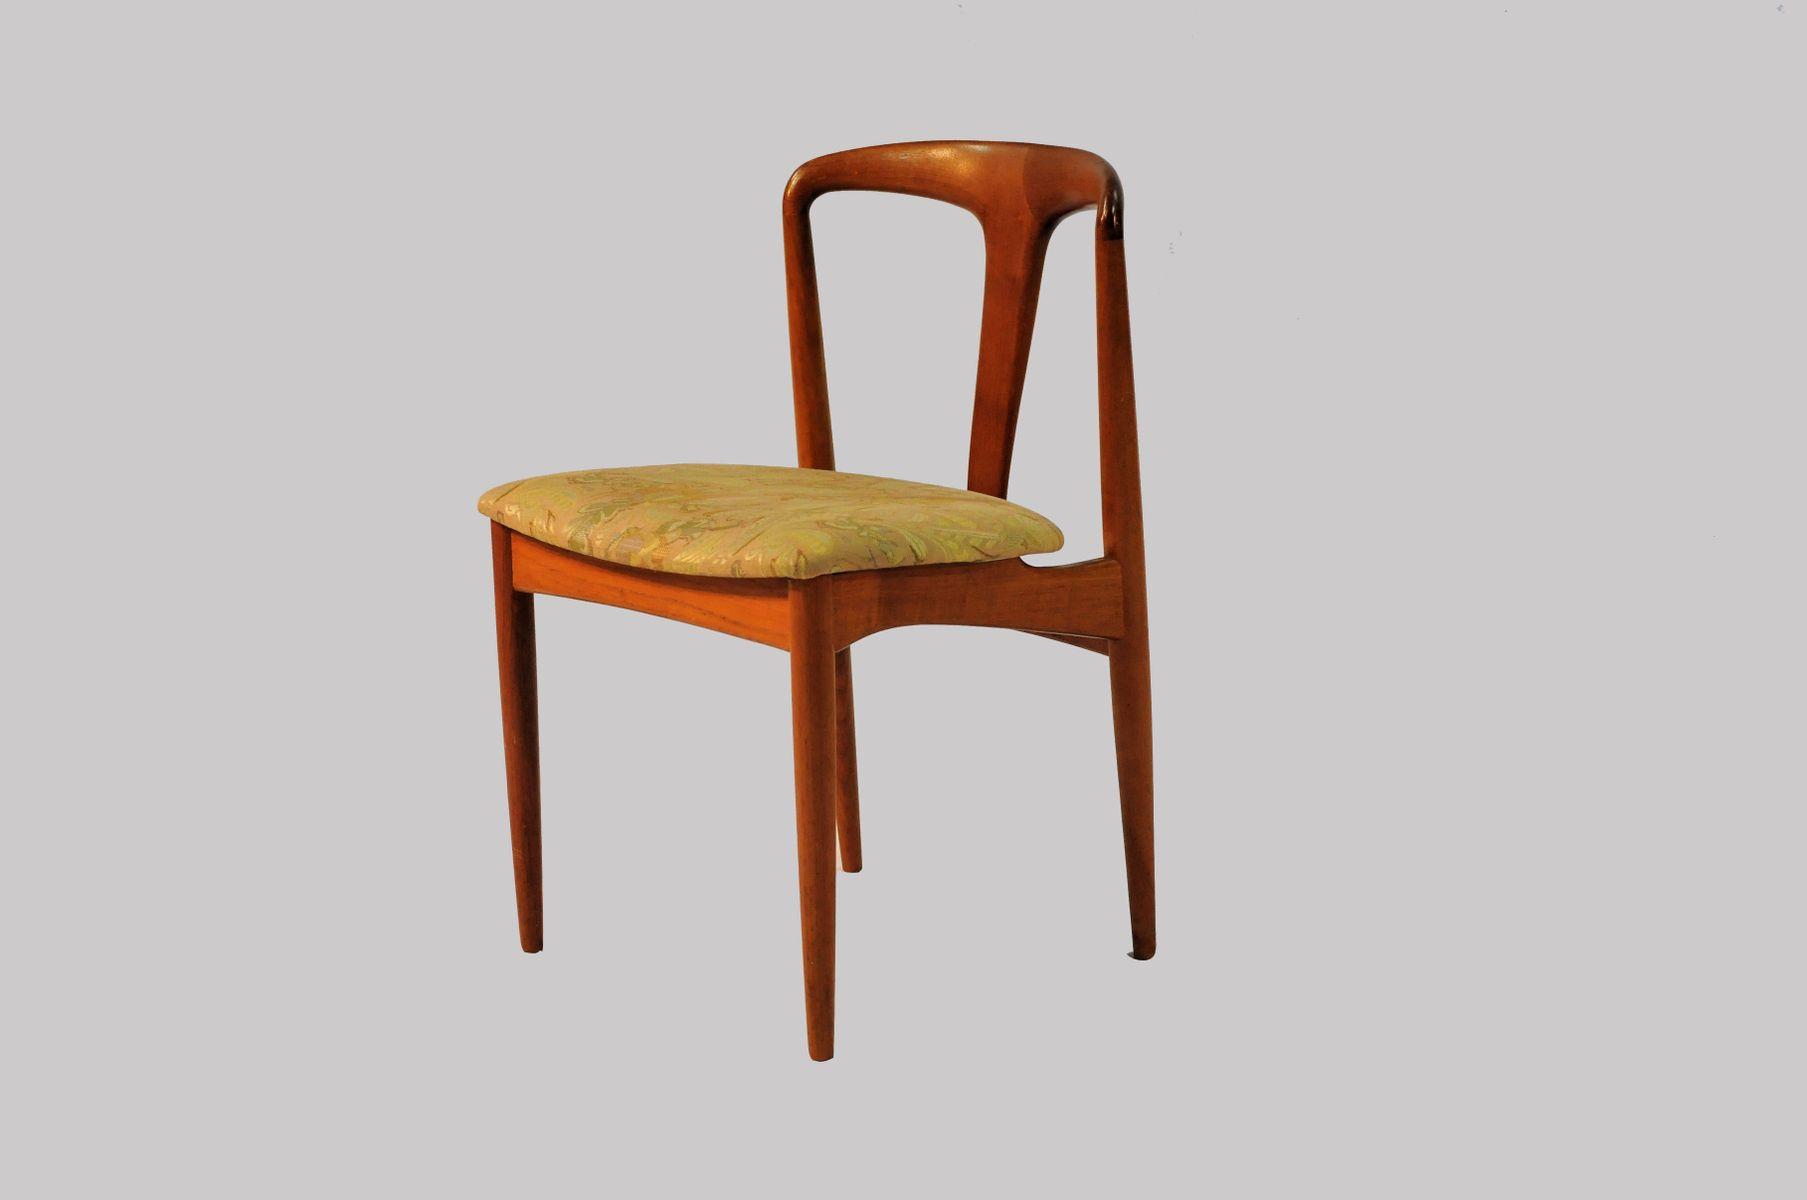 Juliane Dining Chairs in Teak by Johannes Andersen for  : juliane dining chairs in teak by johannes andersen for vamo 1960s set of 6 8 from www.pamono.com size 1808 x 1200 jpeg 44kB